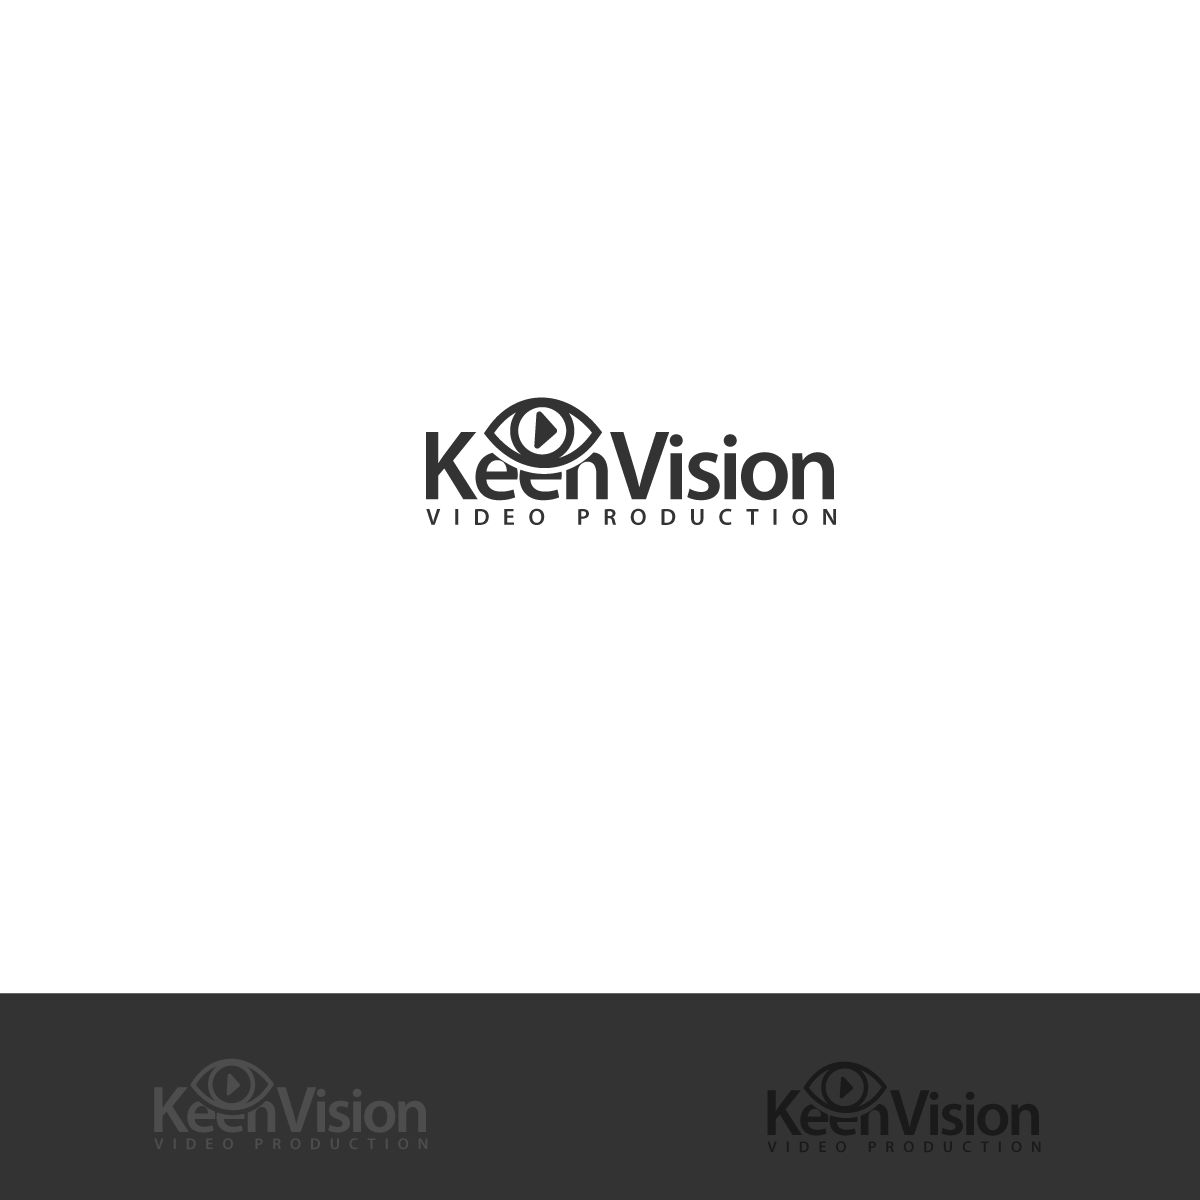 Логотип для KeenVision - дизайнер neyvmila